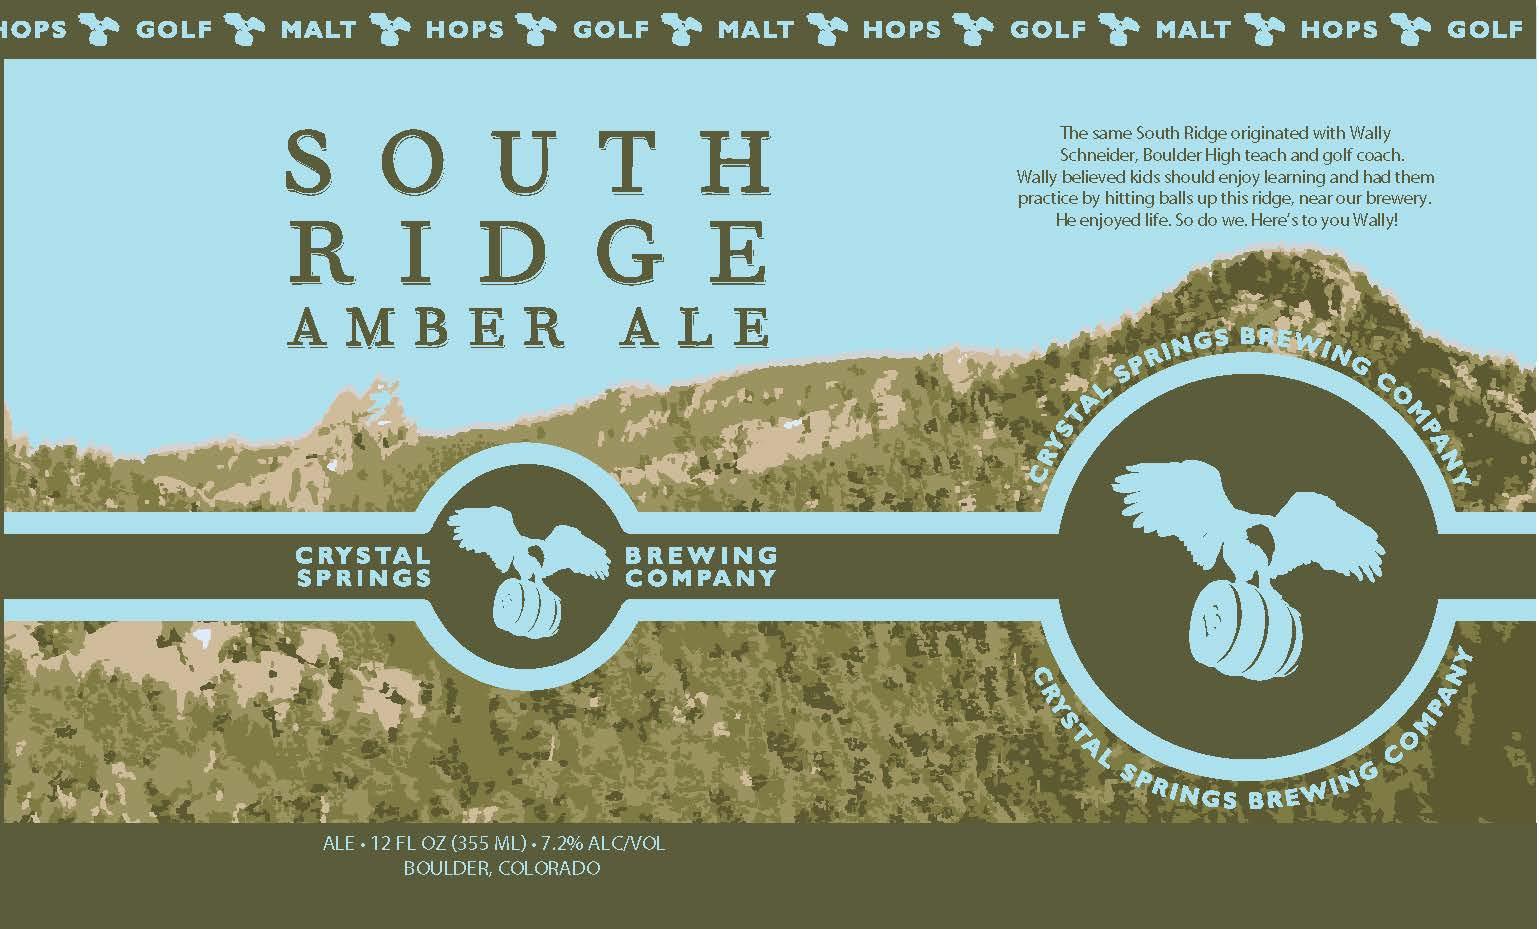 South Ridge Amber